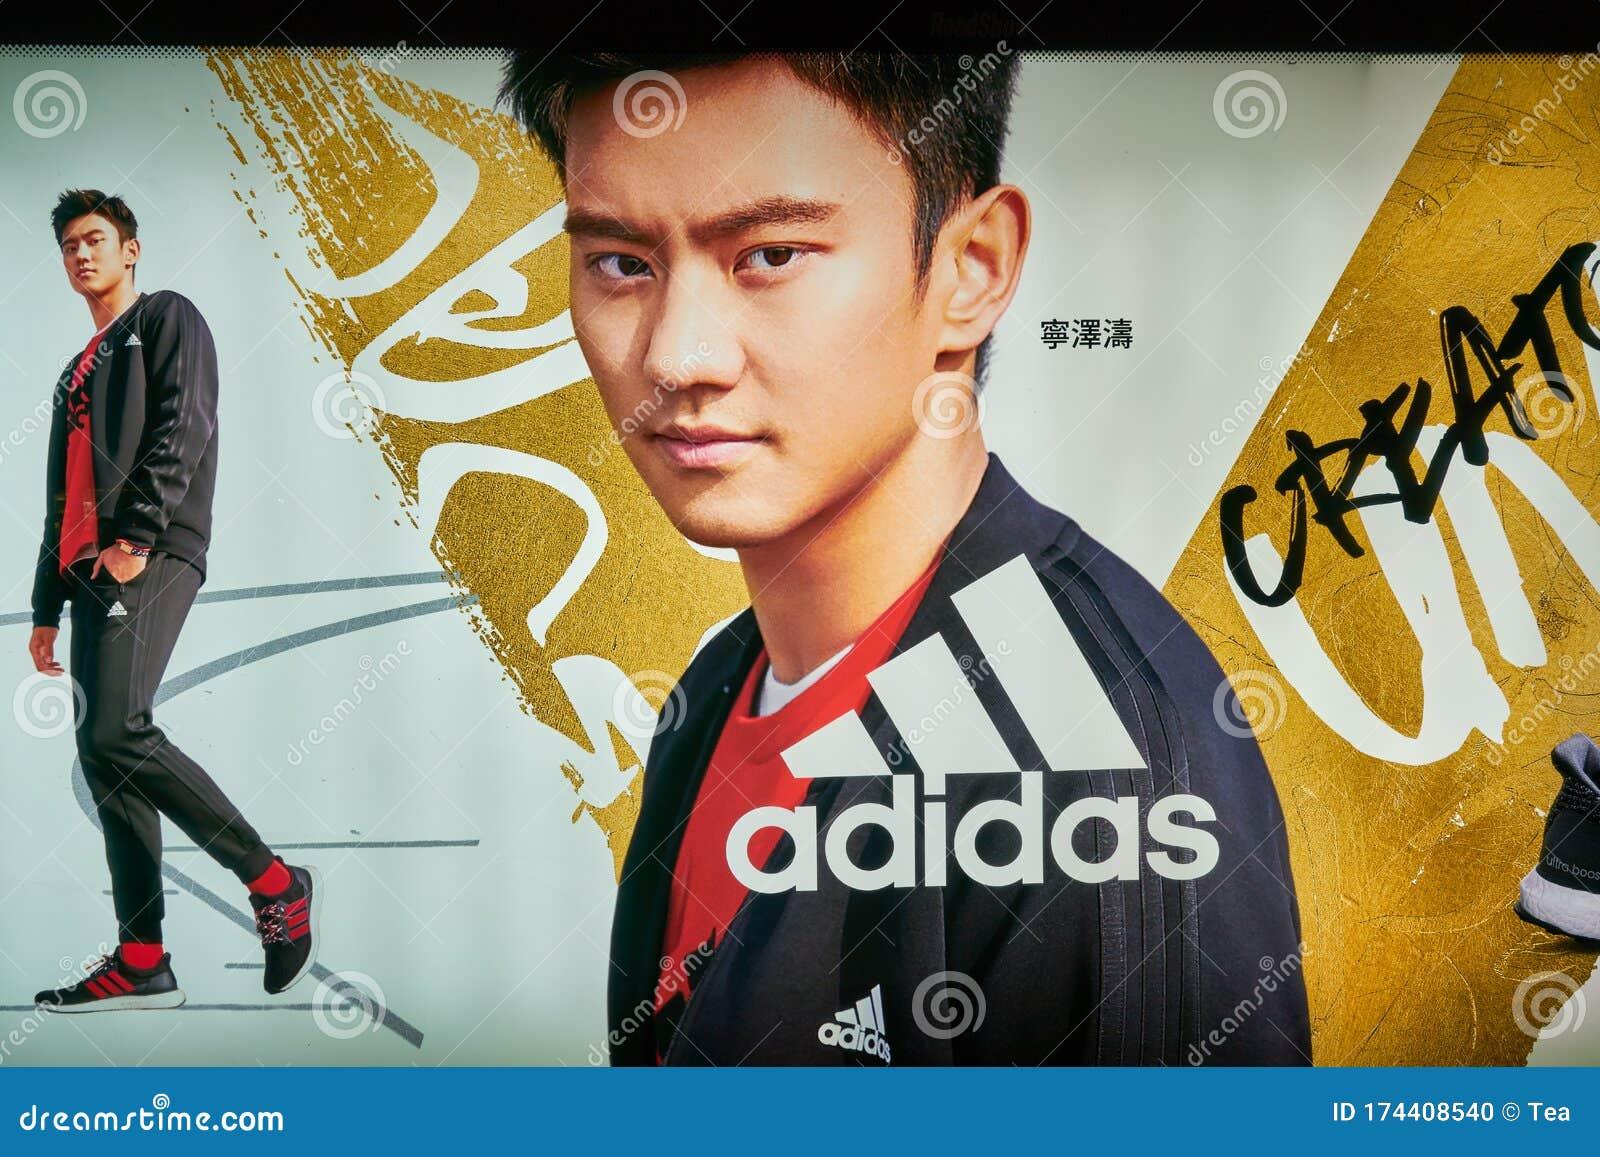 Adidas Advertisement Editorial Image Image Of Kong 174408540